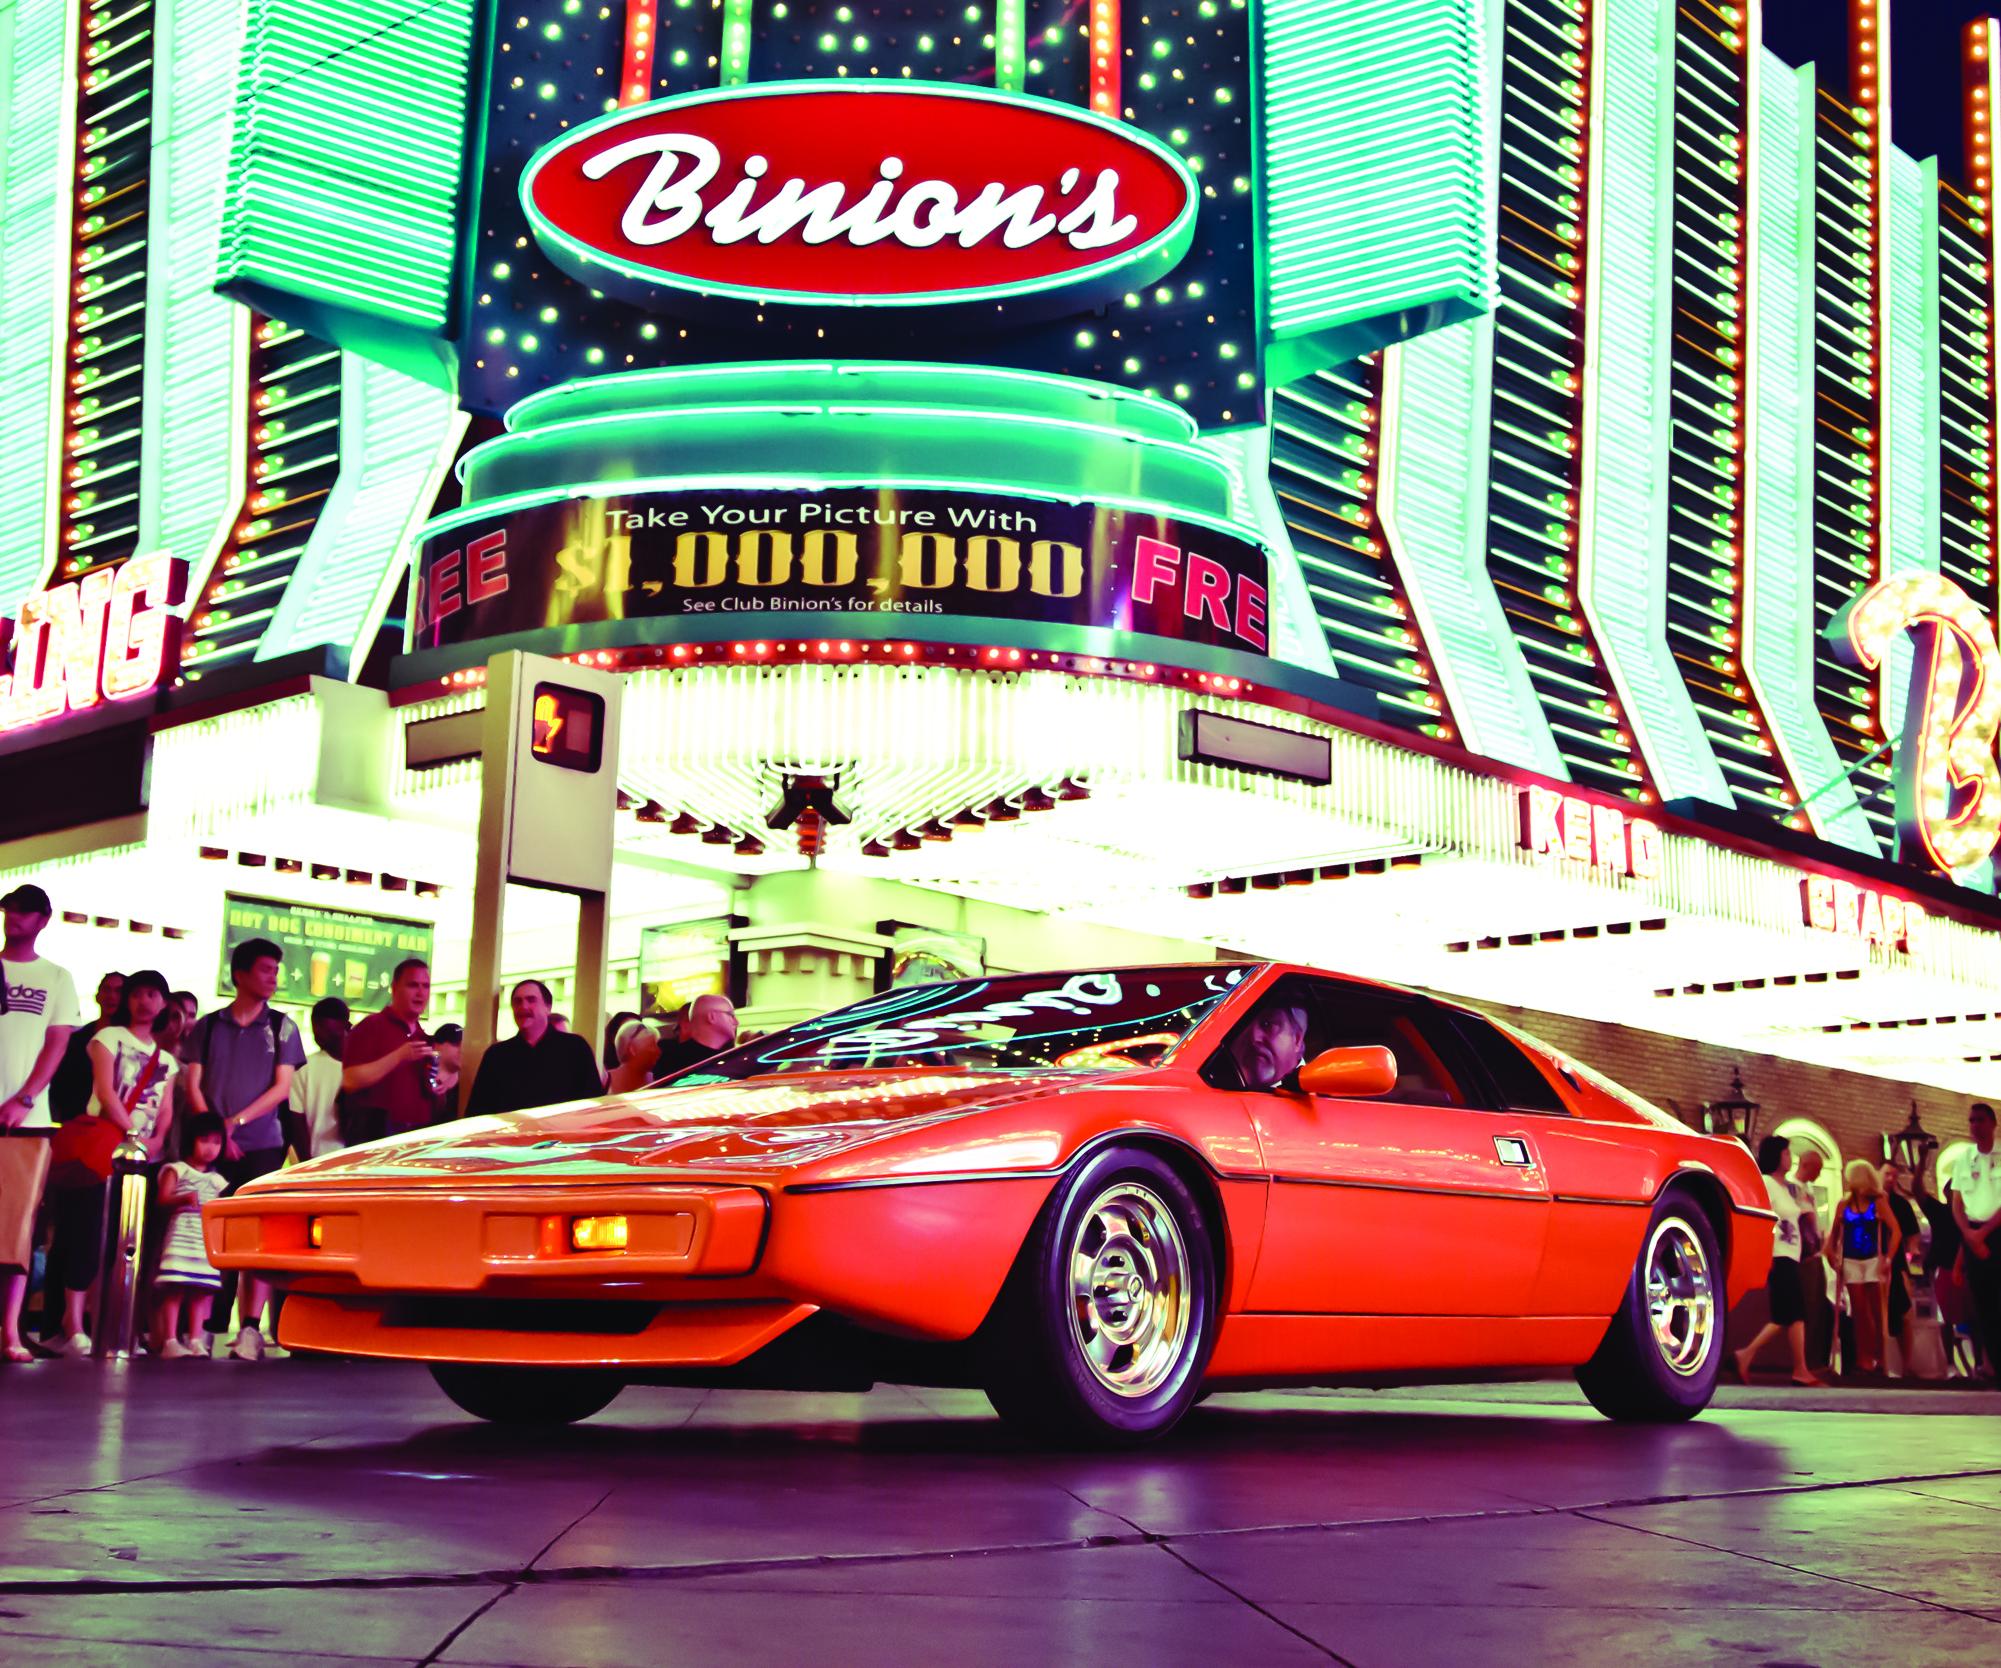 Bond cars on a budget thumbnail